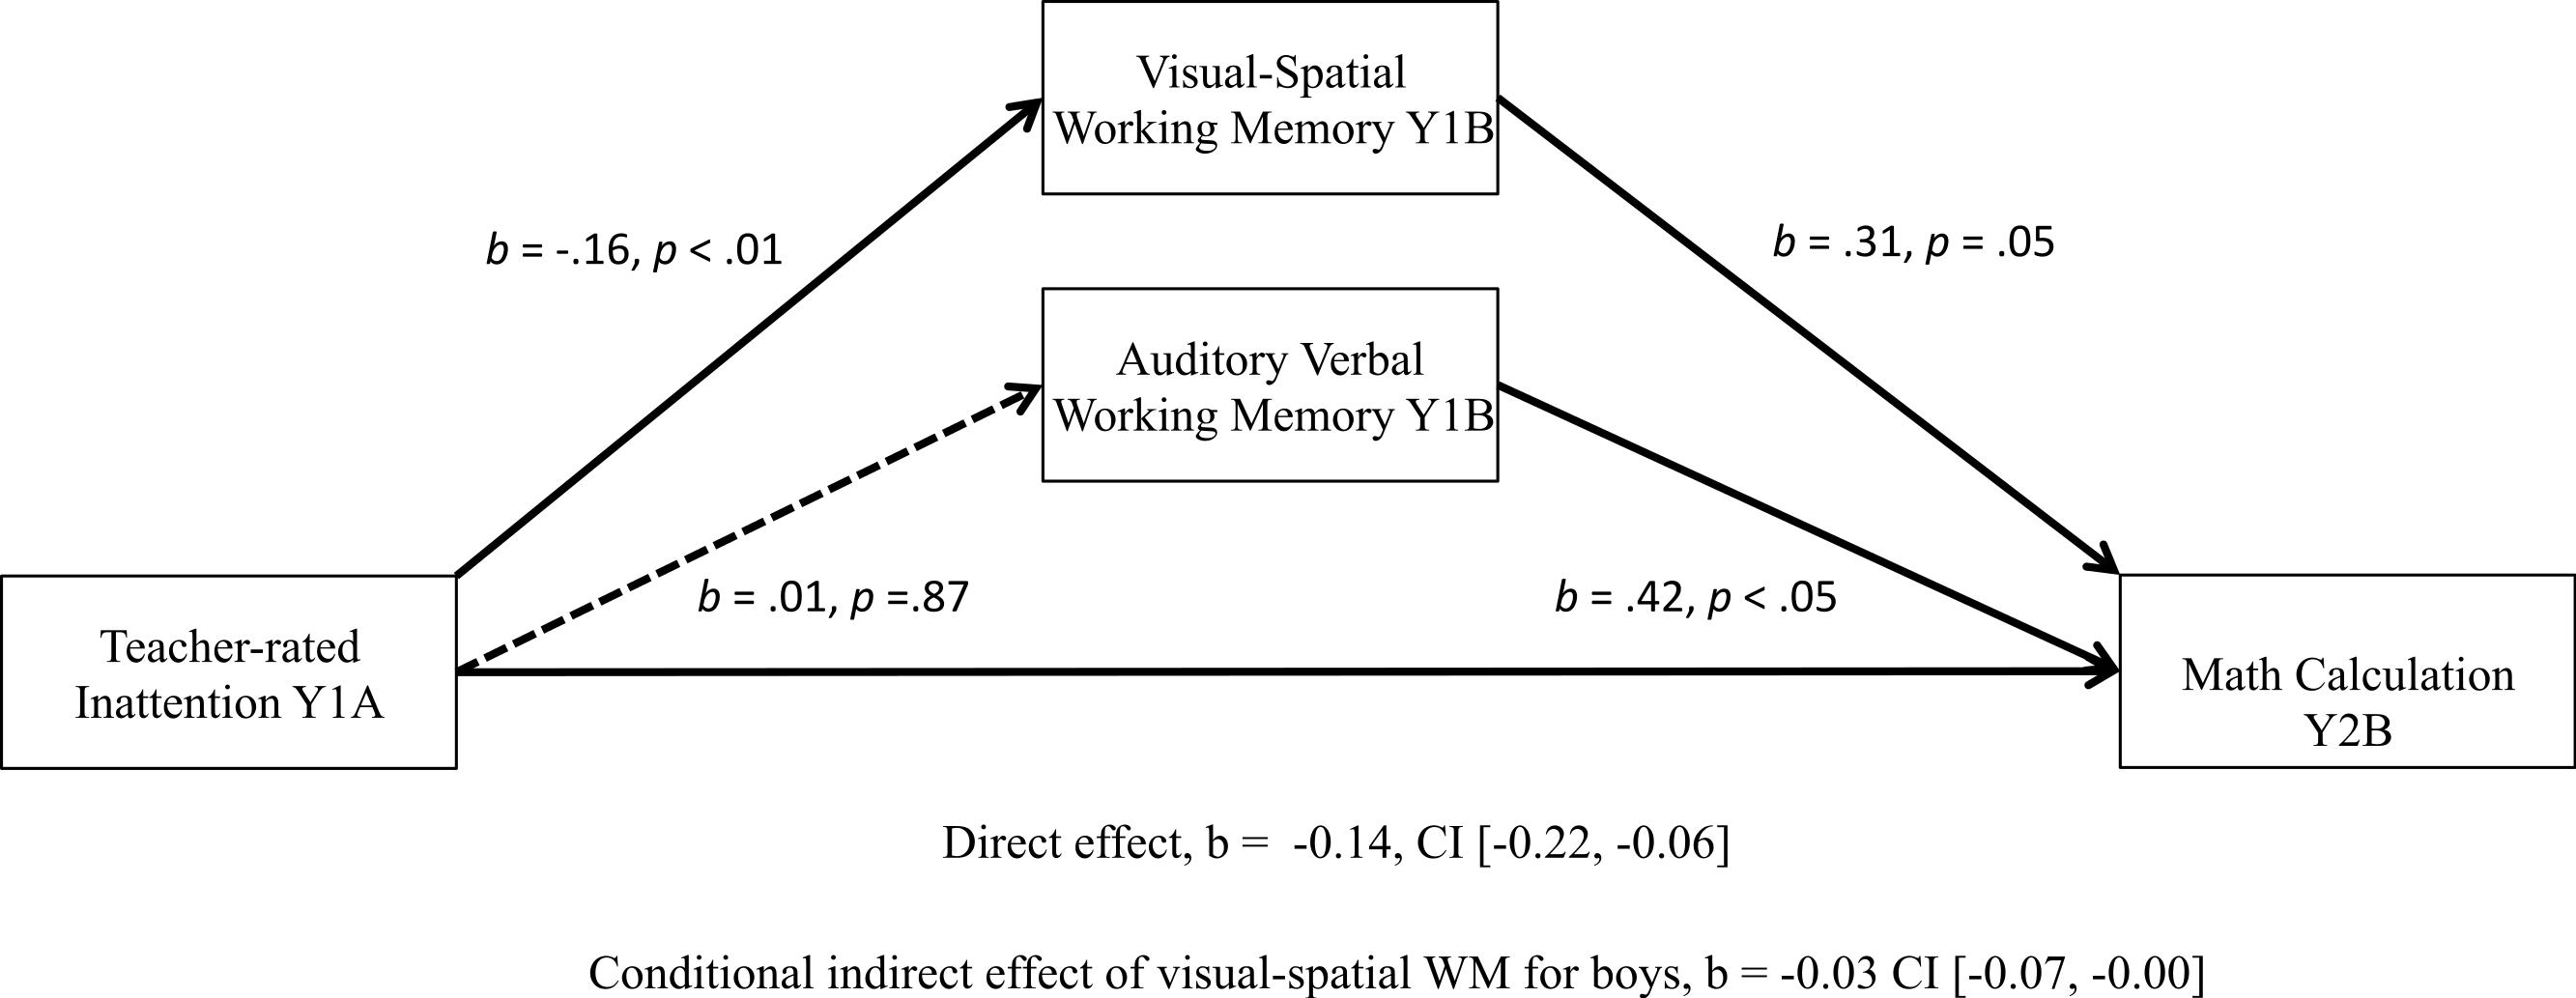 Longitudinal Relations Among Inattention Working Memory